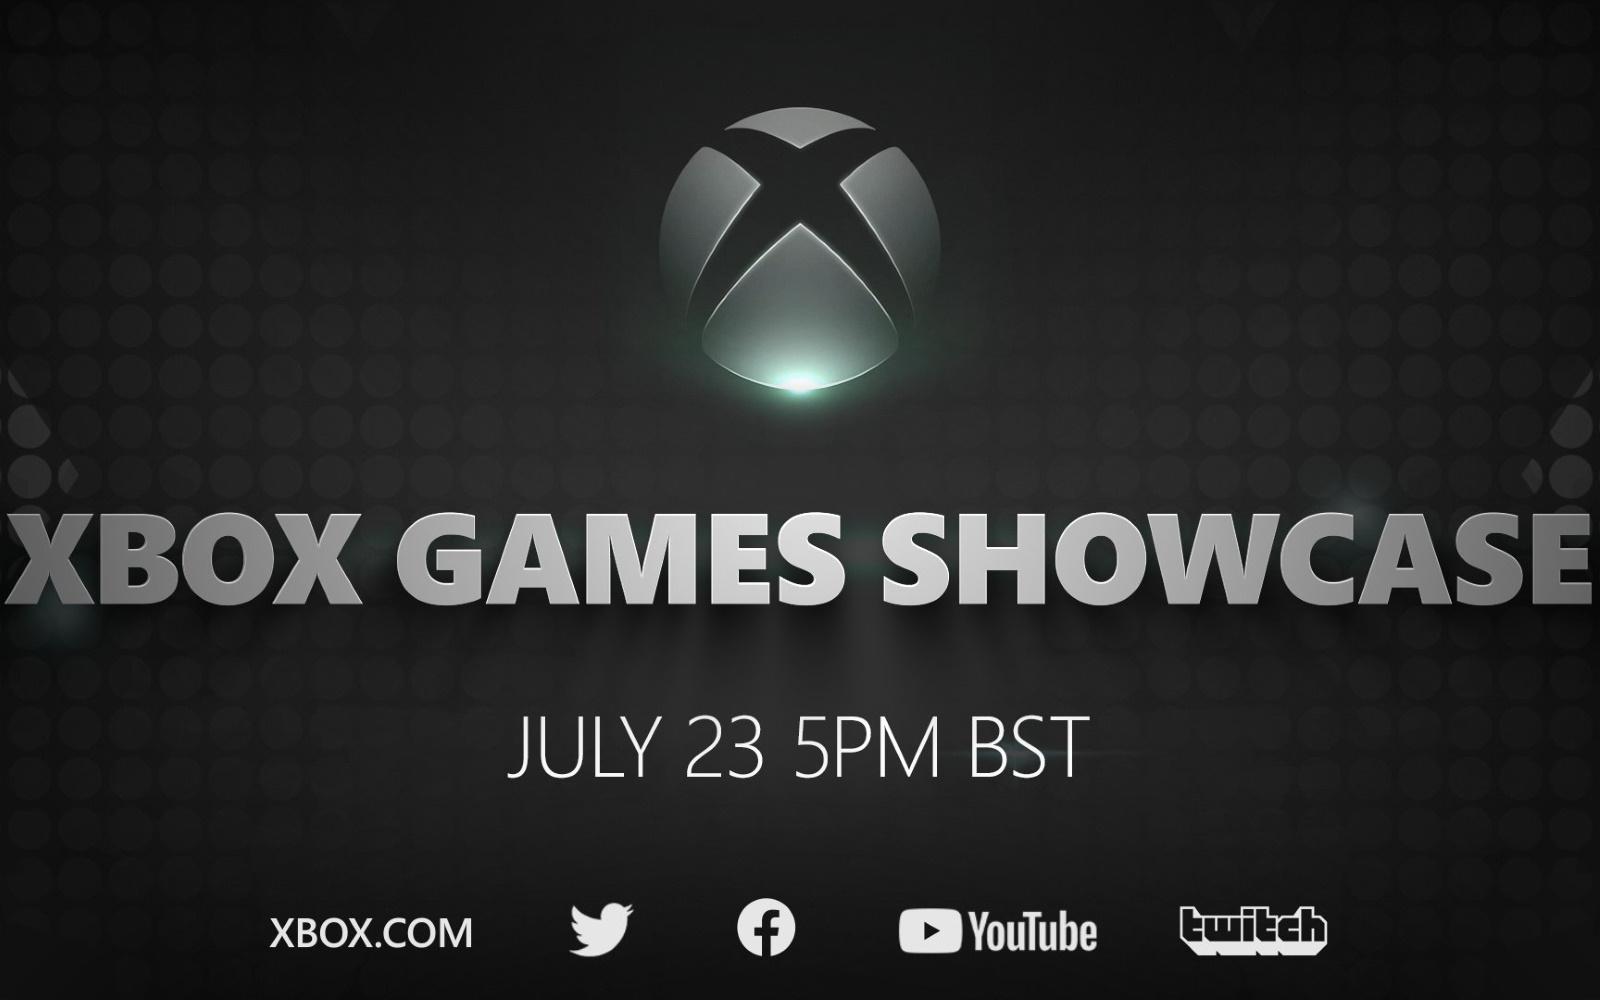 Xbox Games Showcase – All The Announcements